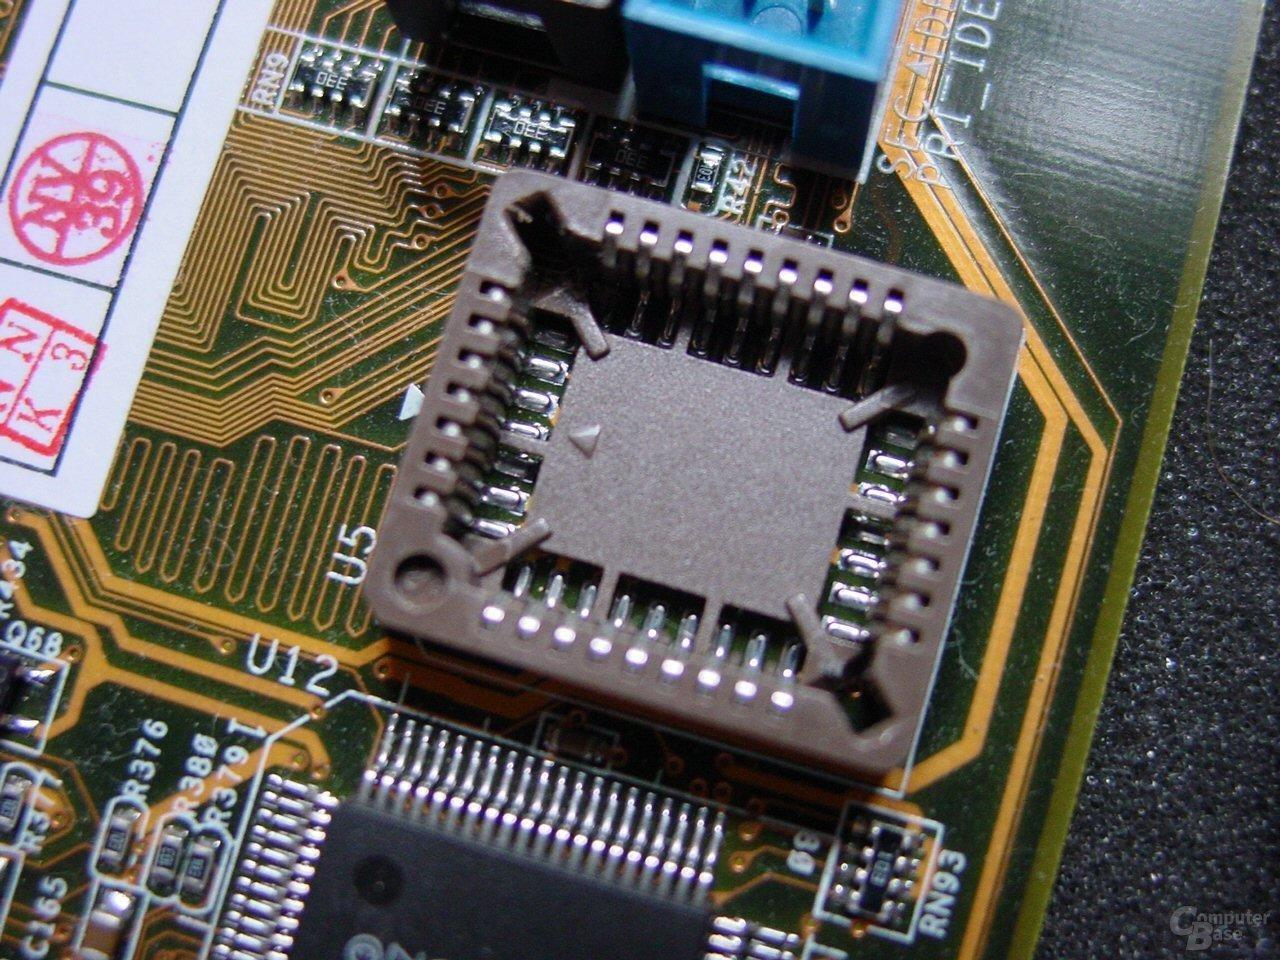 Der BIOS-Sockel des Asus A7N8X